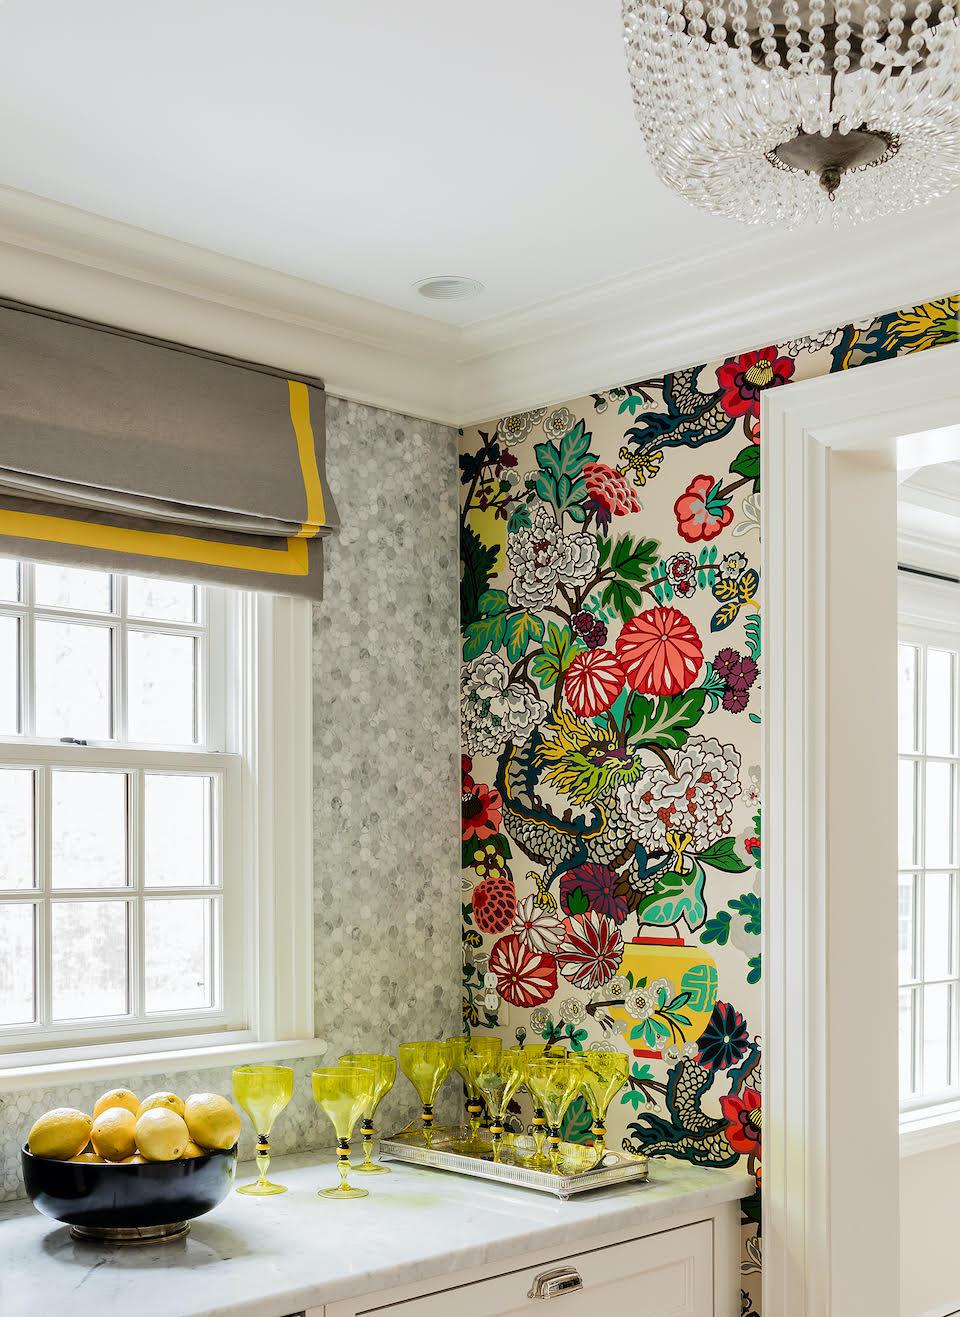 9 kitchen wallpaper ideas – modern designs to update your cooking ...